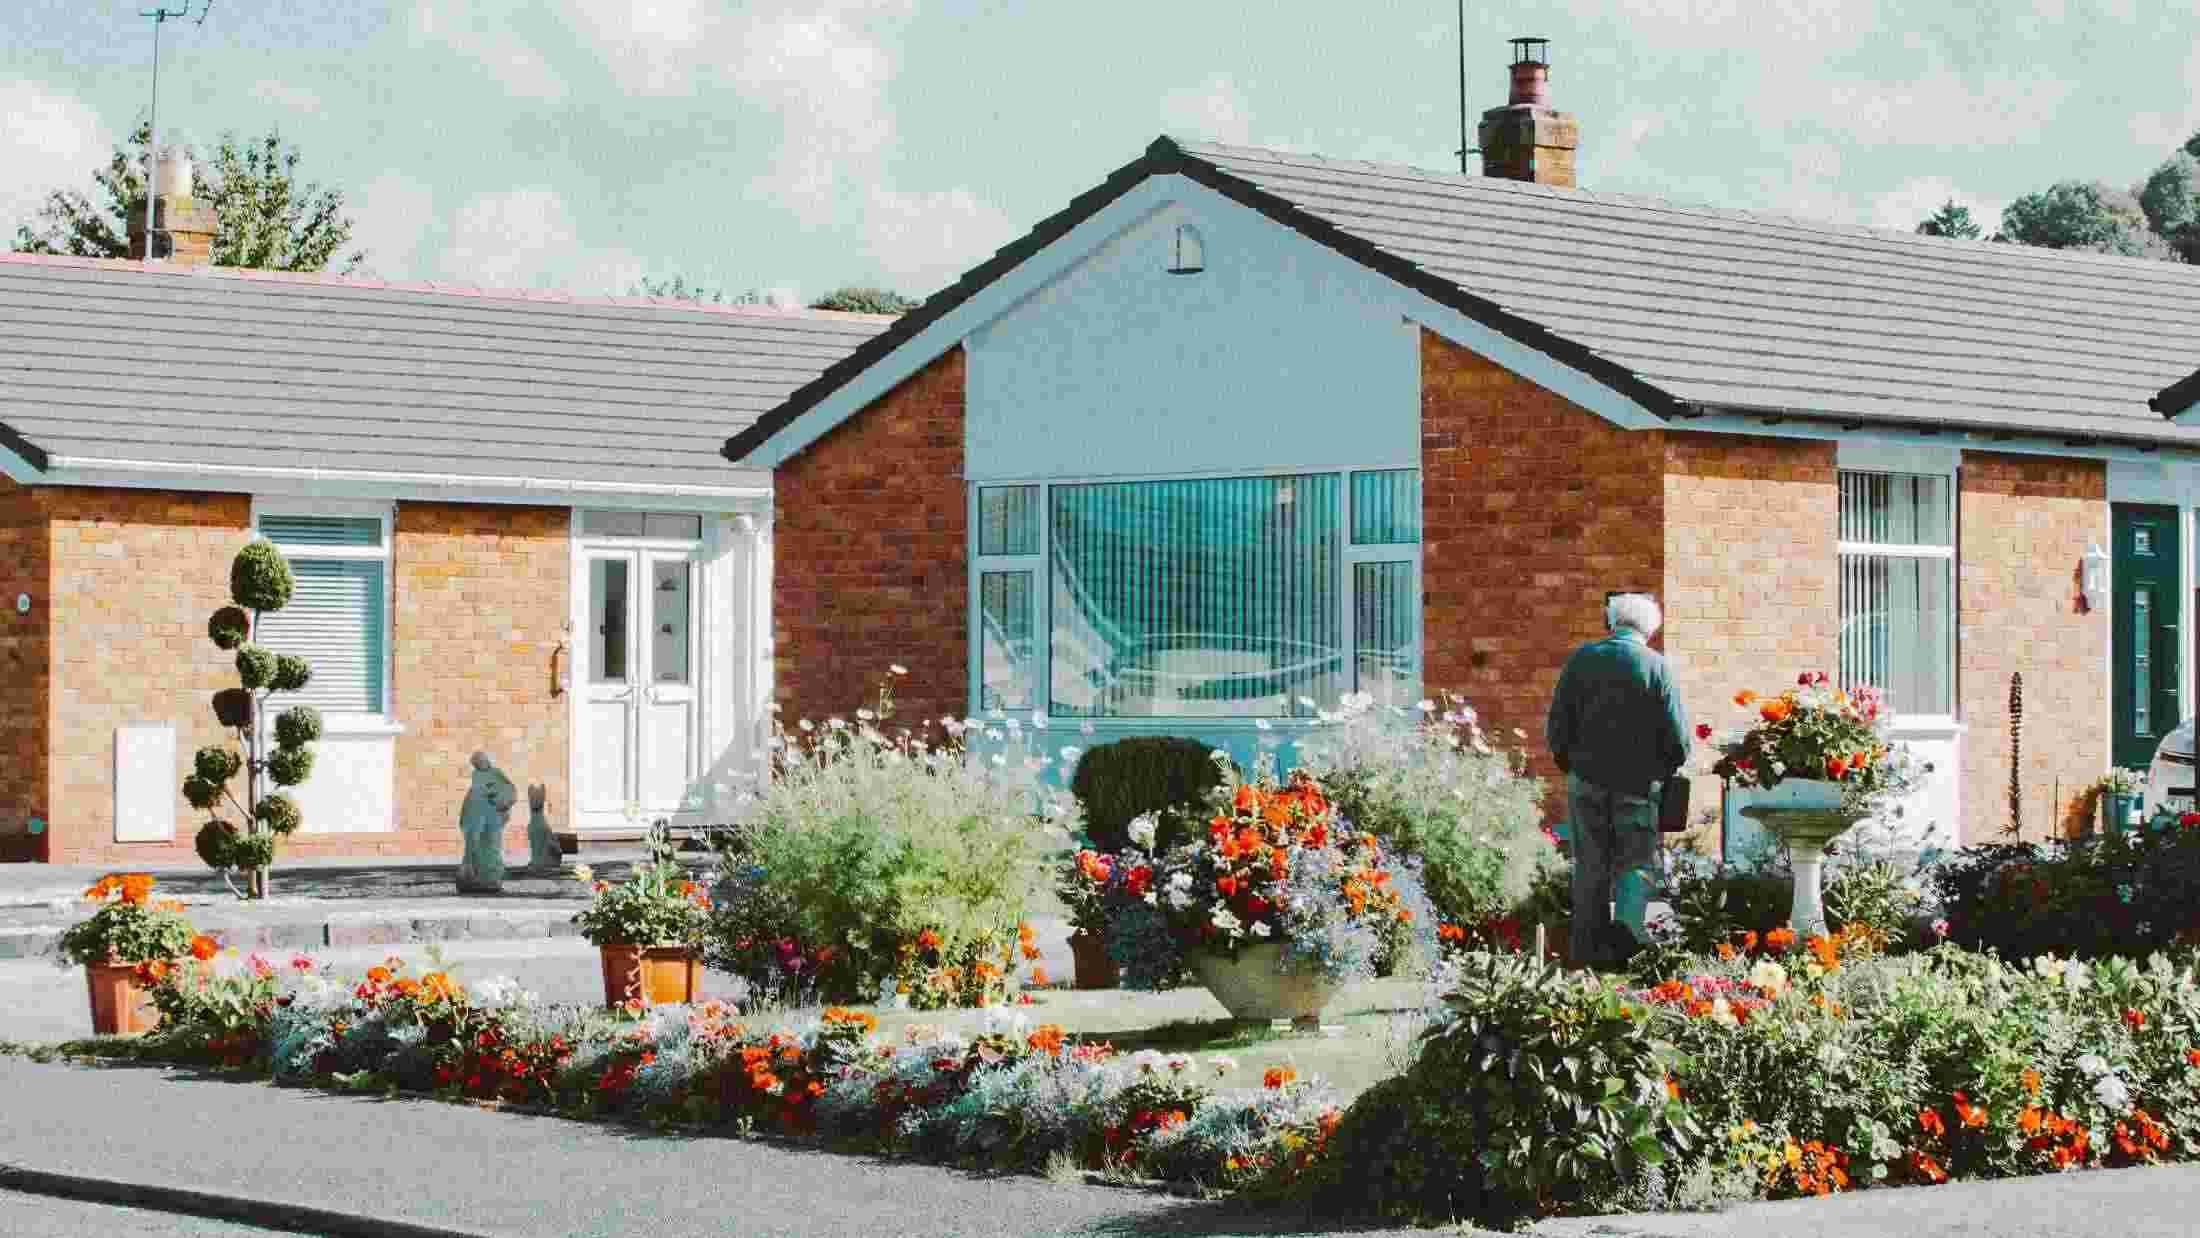 Bungalow with elderly man in front garden